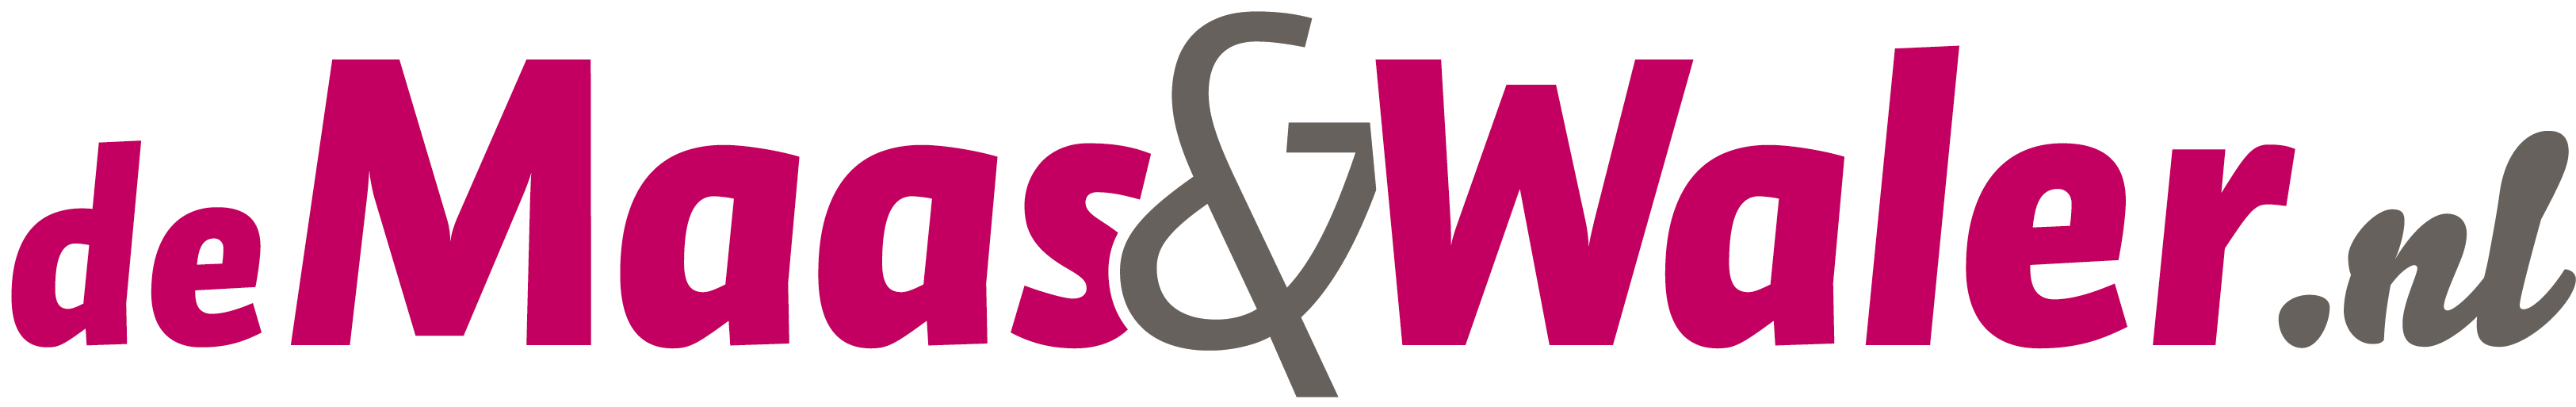 Logo demaasenwaler.nl